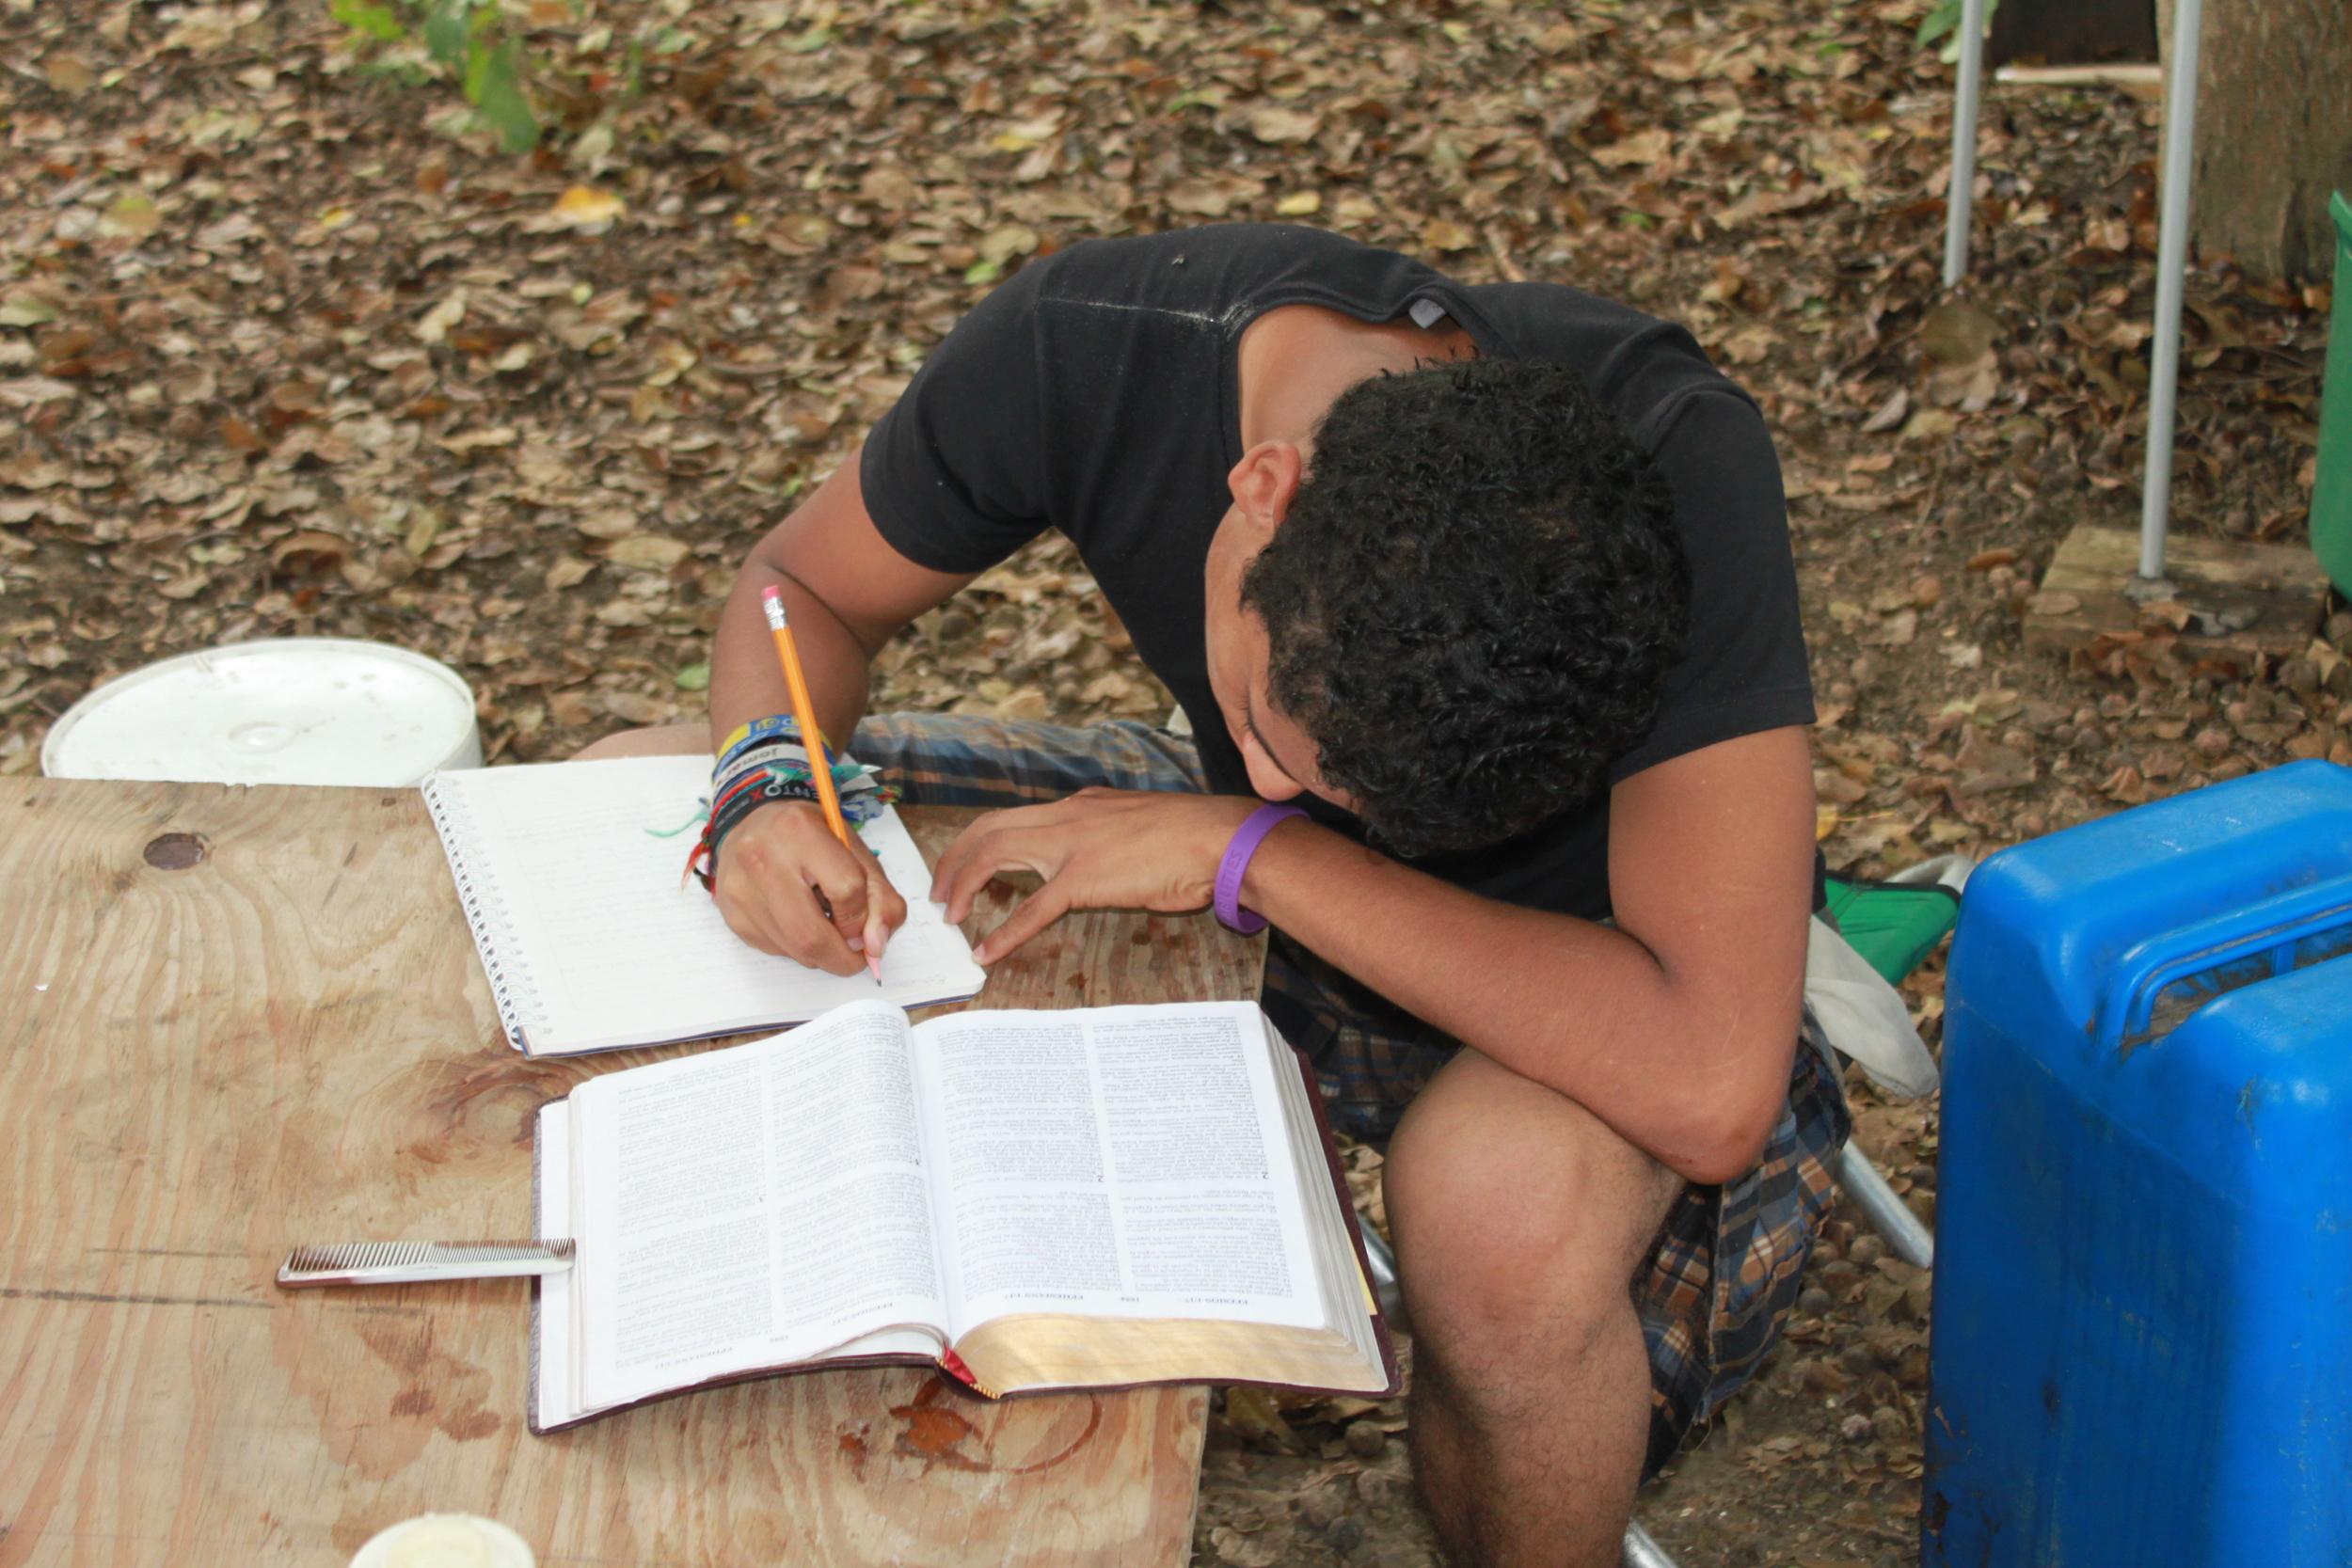 Bible study at the beach Snaider.jpg